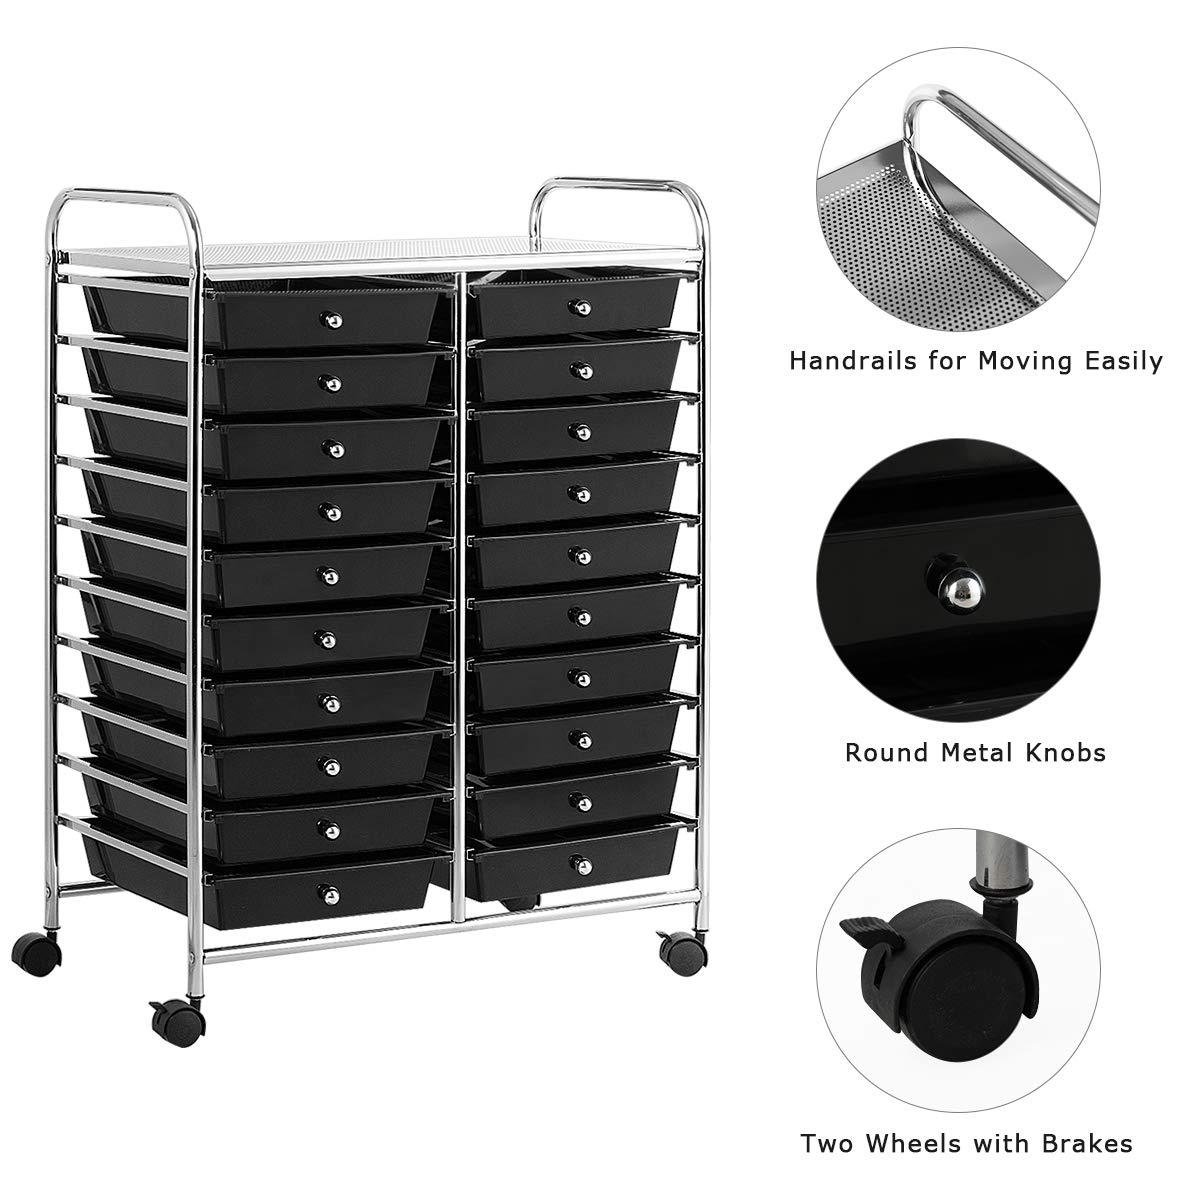 Giantex 20 Drawer Rolling Storage Cart Tools Scrapbook Paper Office School Organizer 25 x 15 x 35 Inch, Black